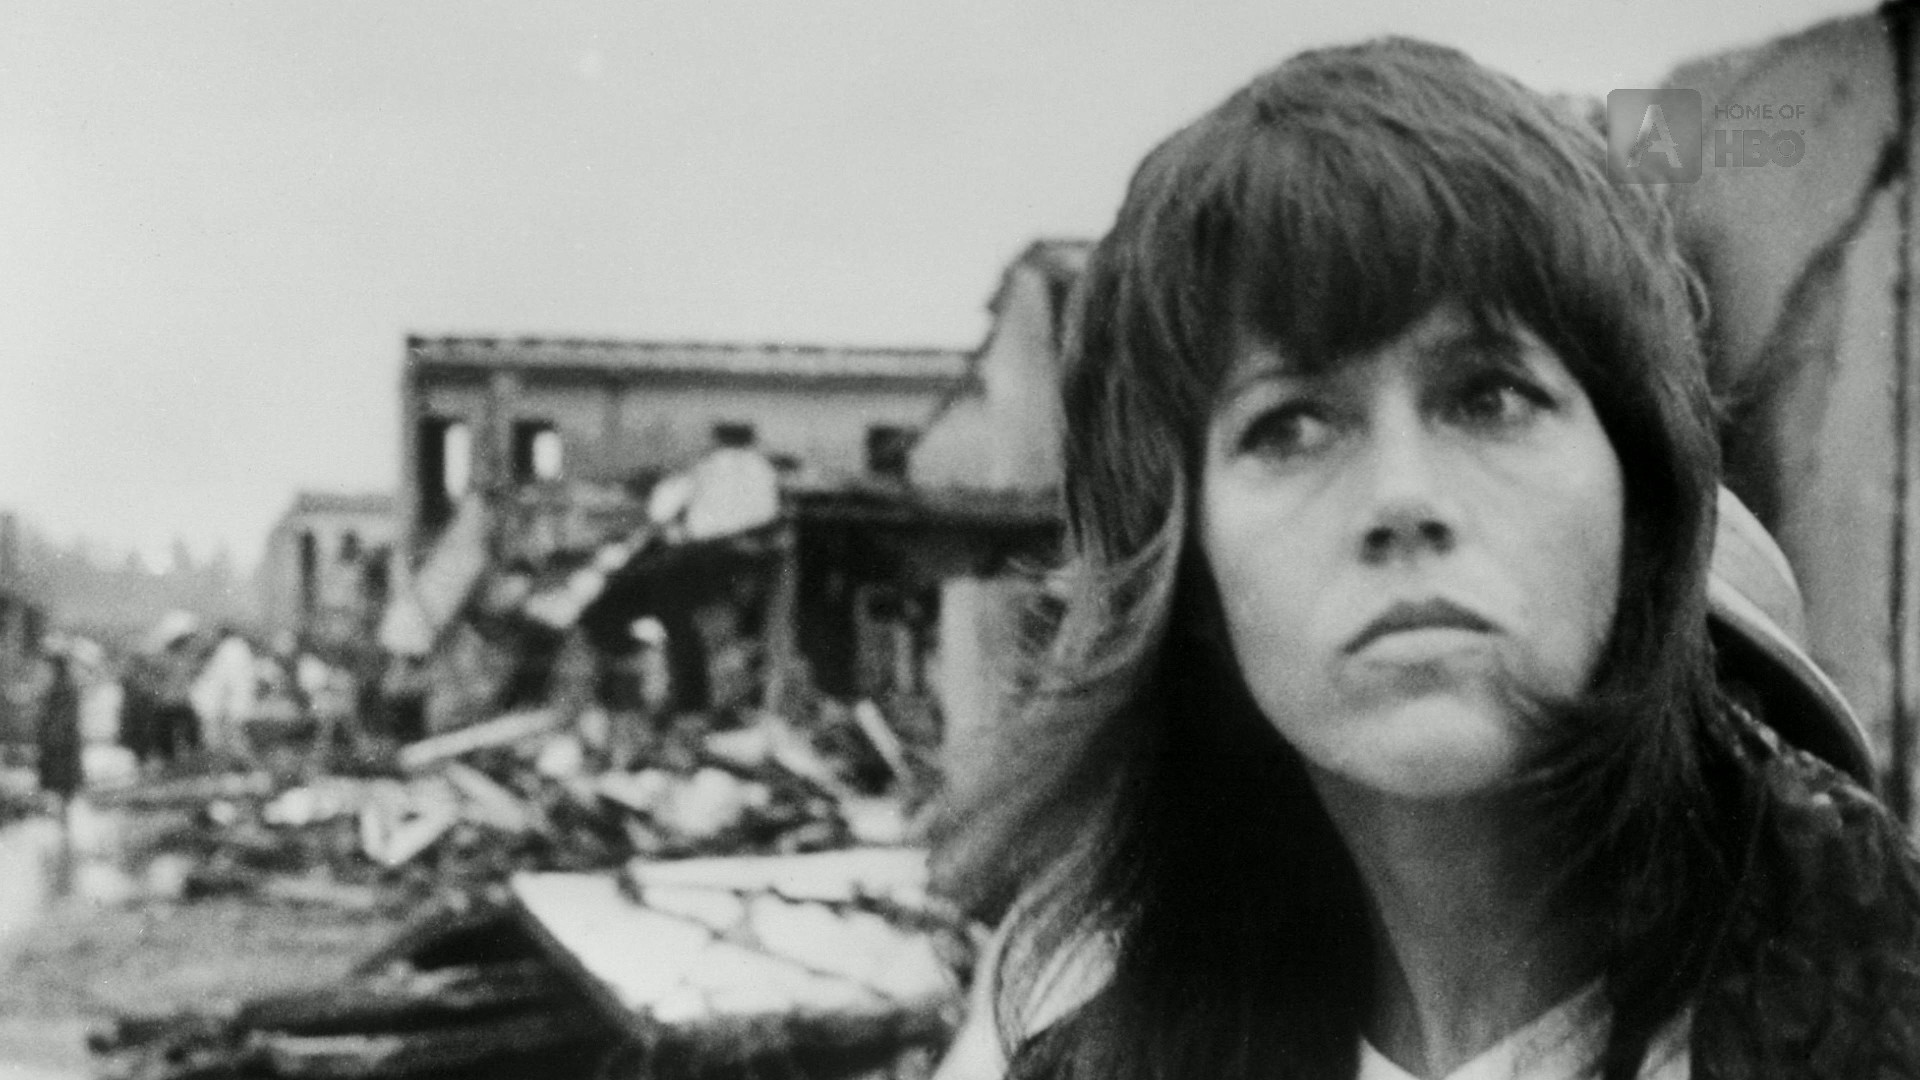 Джейн Фонда: Жизнь в пяти актах / Jane Fonda in Five Acts (2018/HDTV) 1080i, P2